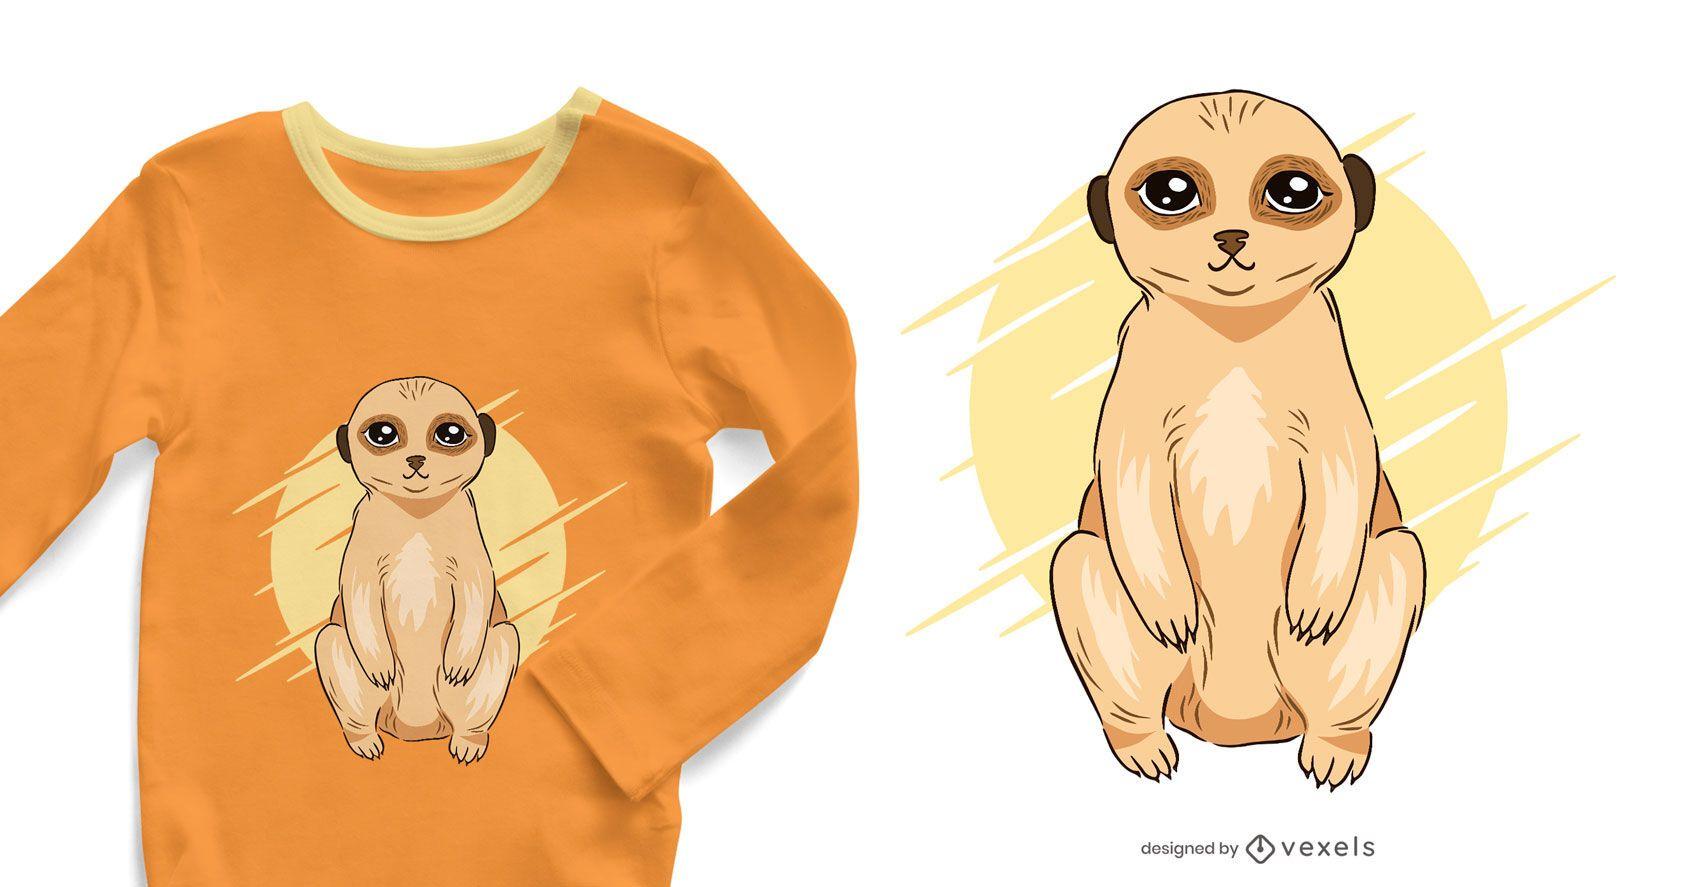 Cute meerkat t-shirt design